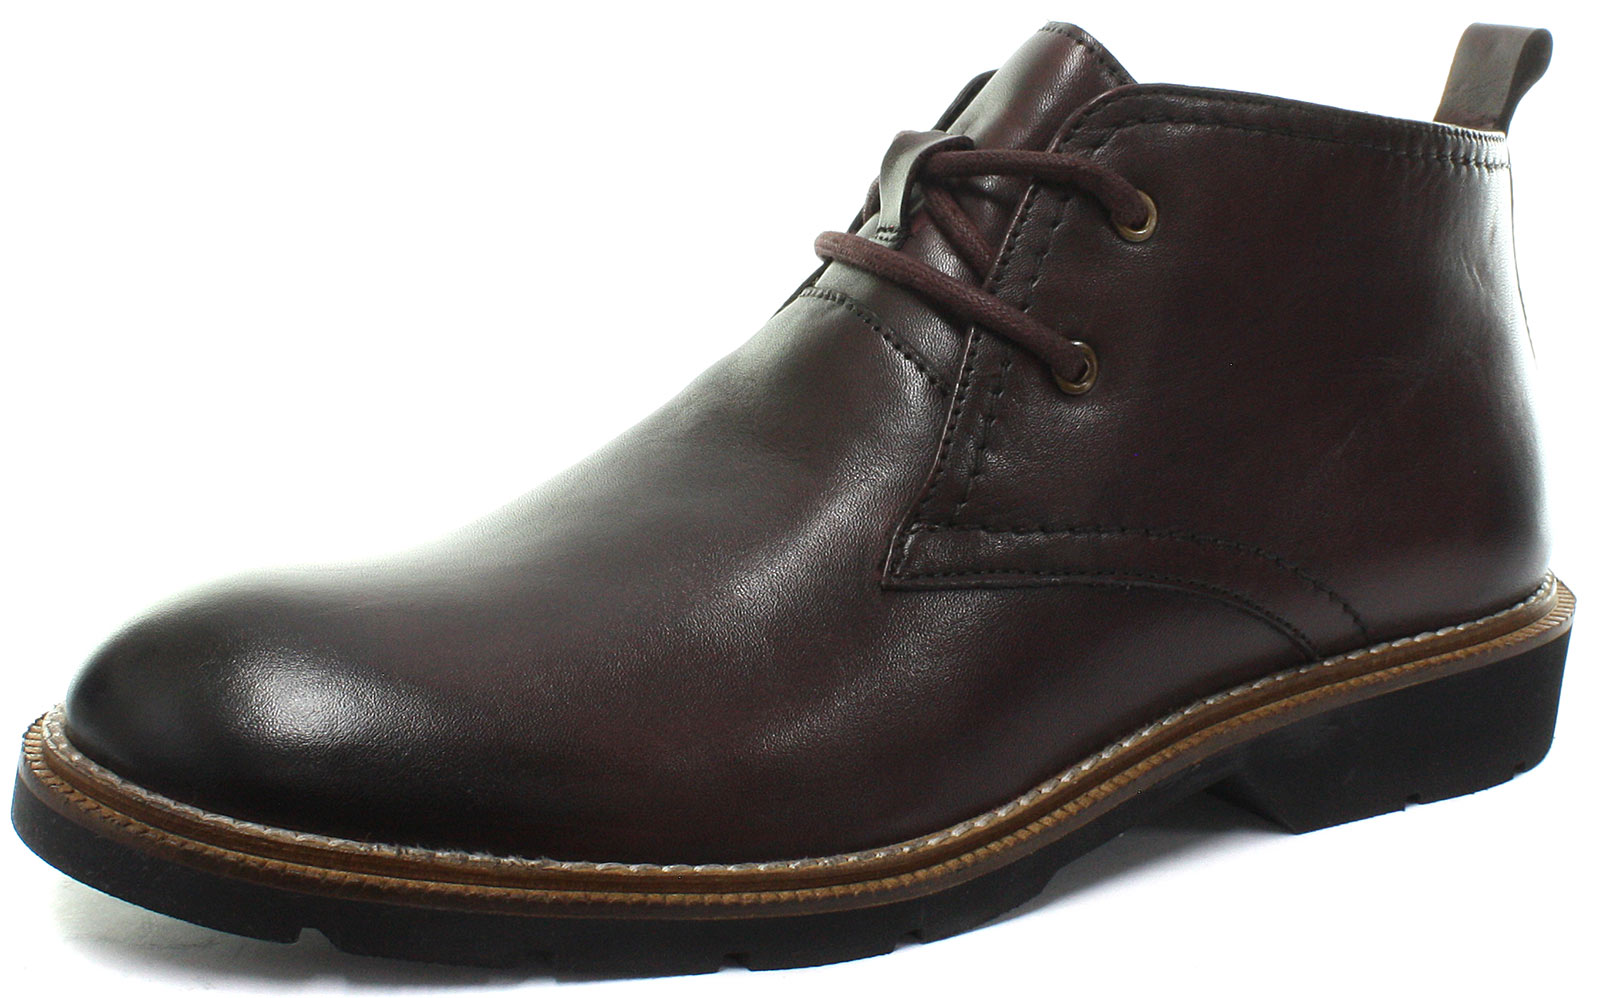 New-Roamers-2-Eye-Mens-Chukka-Boots-ALL-SIZES